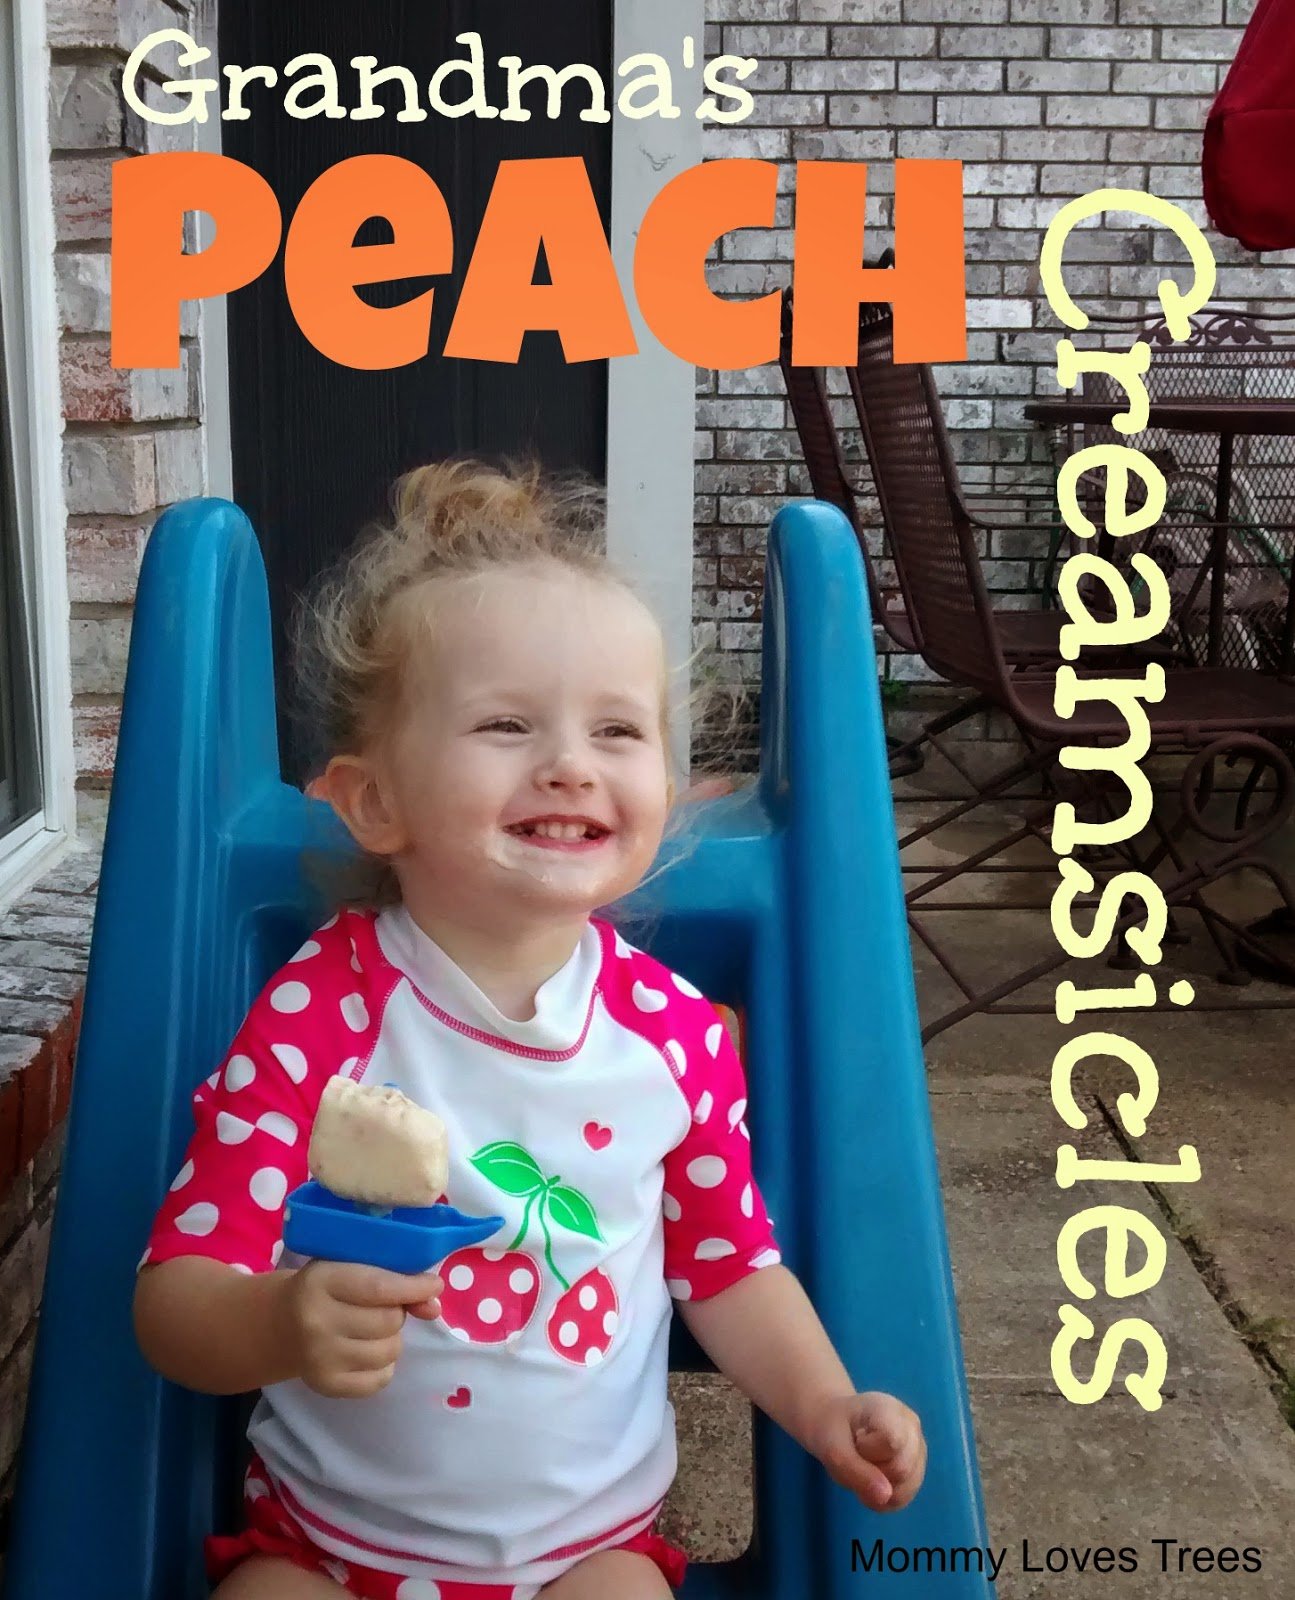 Grandma's Peach Creamsicles